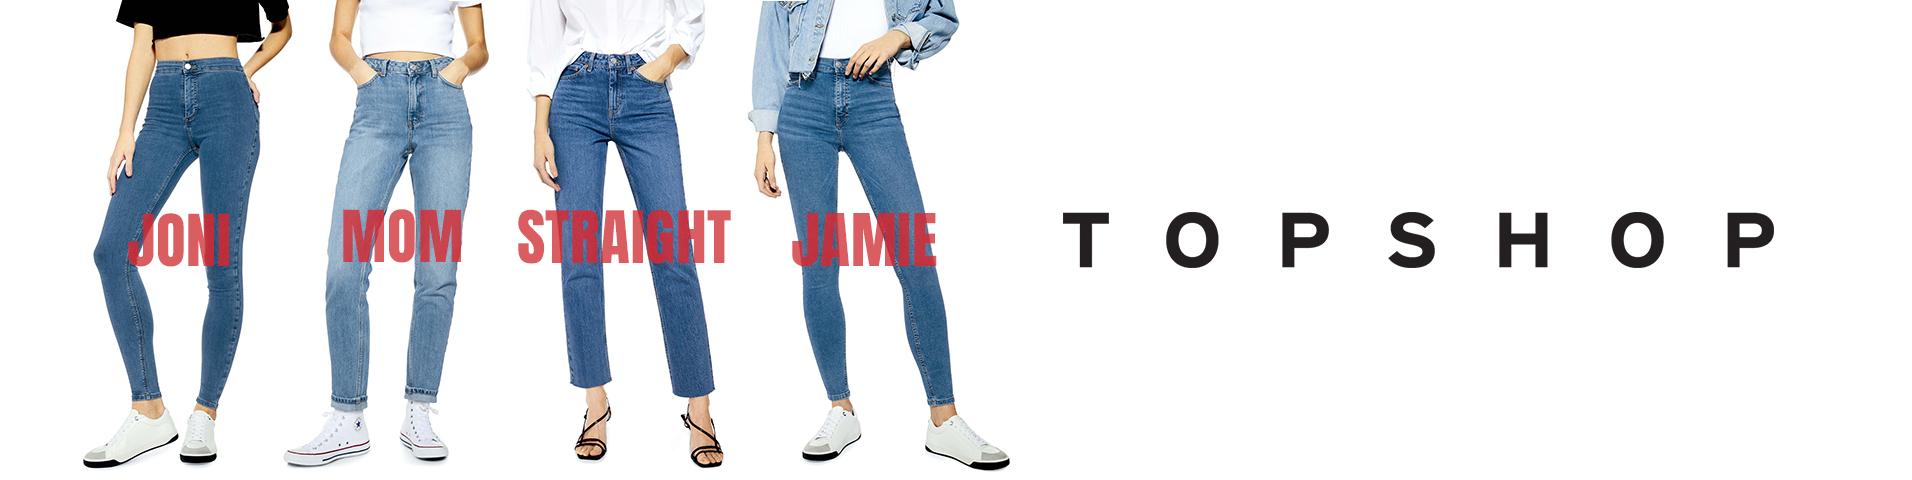 Pantalones vaqueros azules Topshop de mujer | Comprar jeans